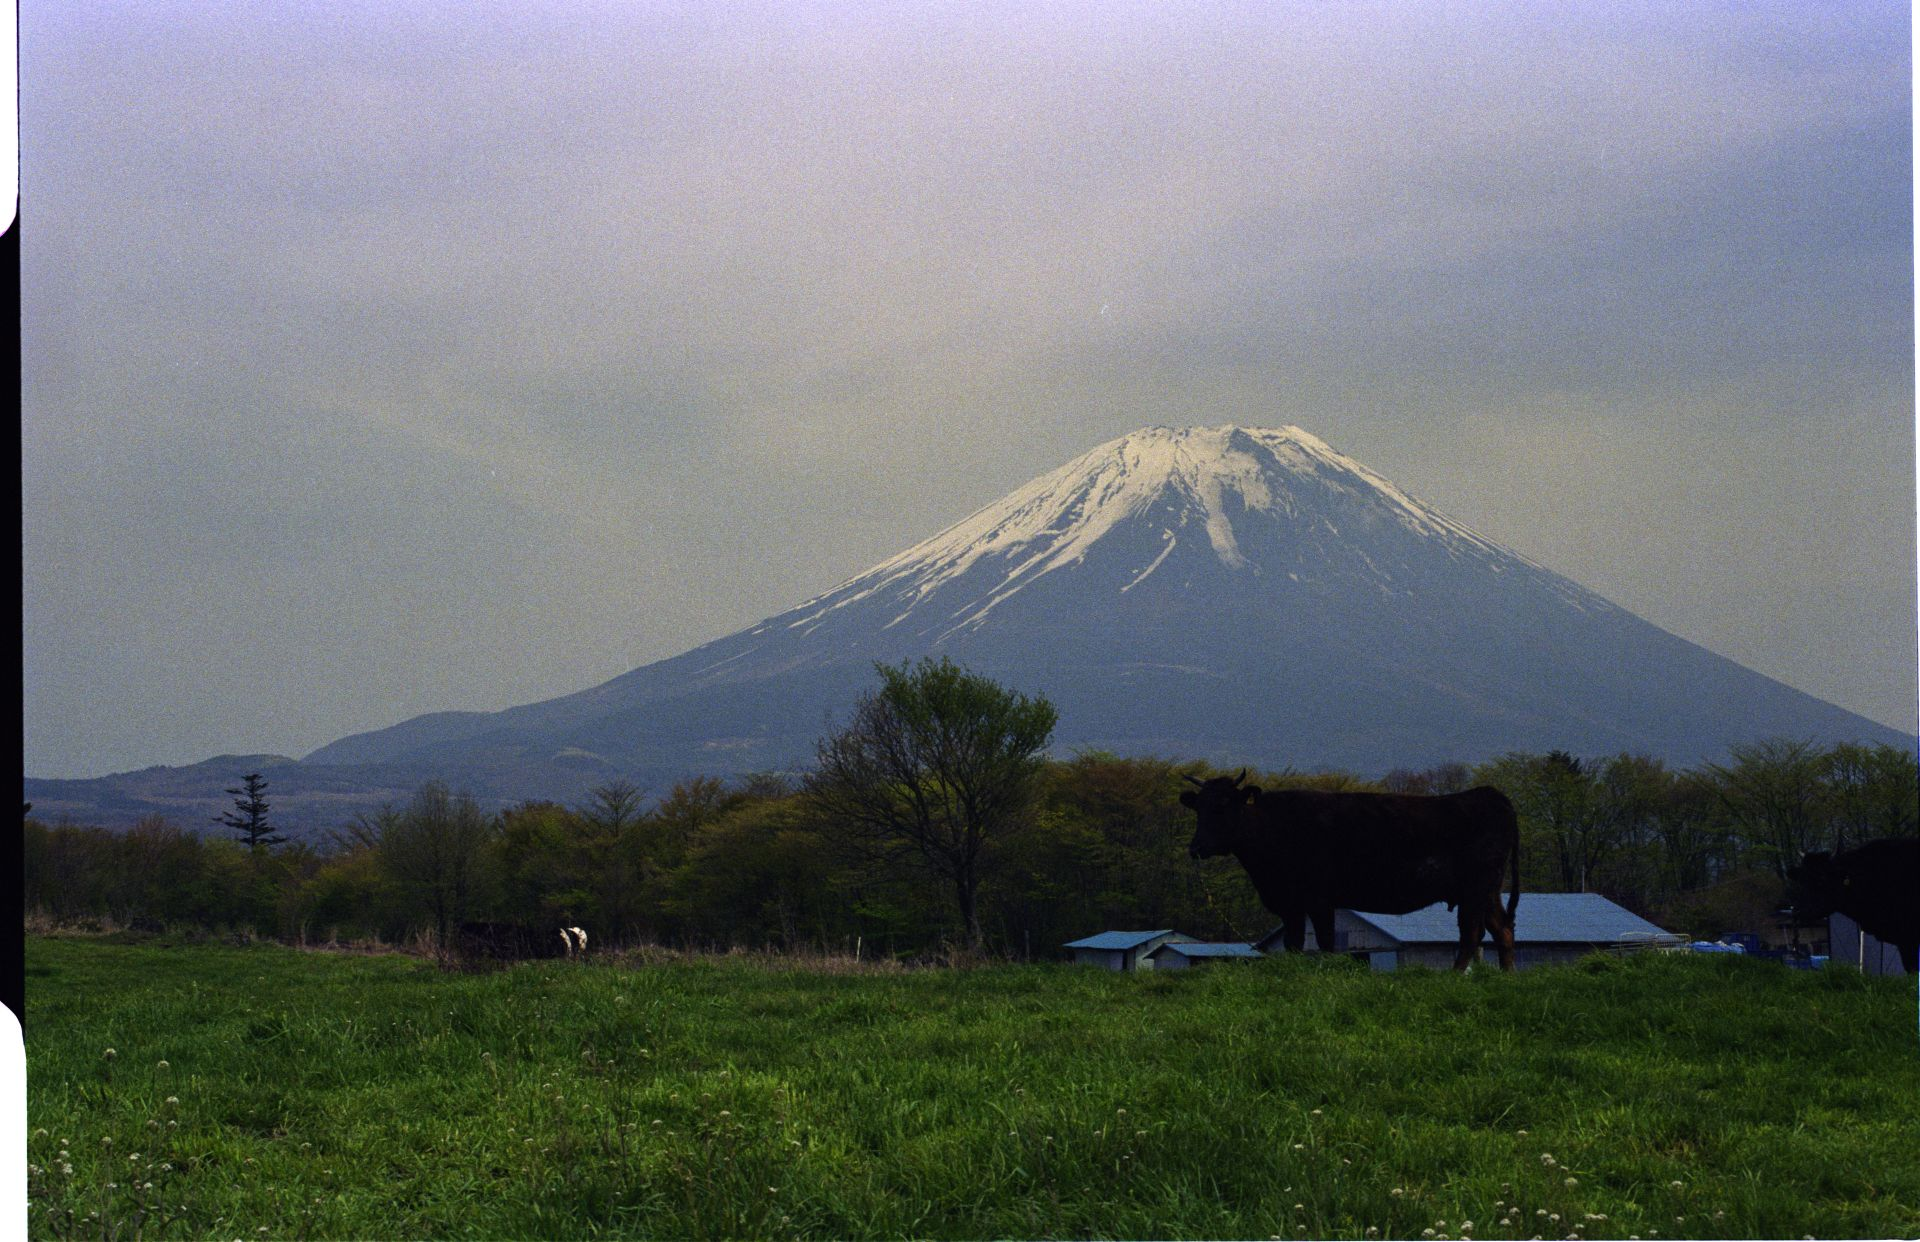 f:id:yasuo_ssi:20201015230025j:plain